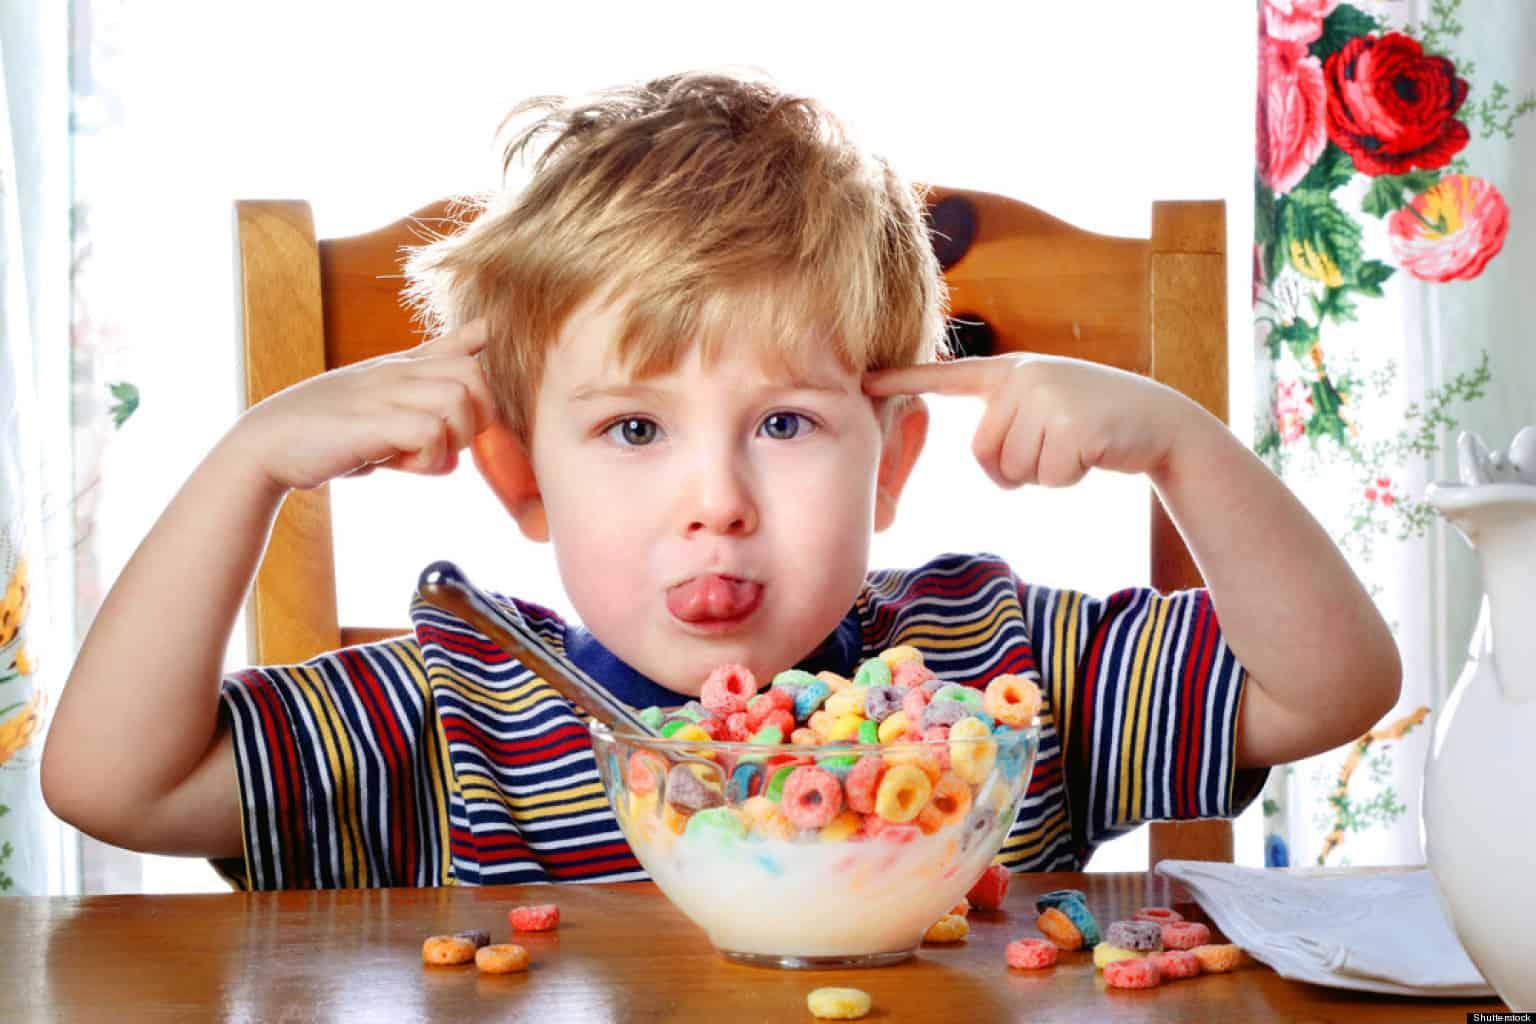 Sugar Makes Kids Hyper – science myth